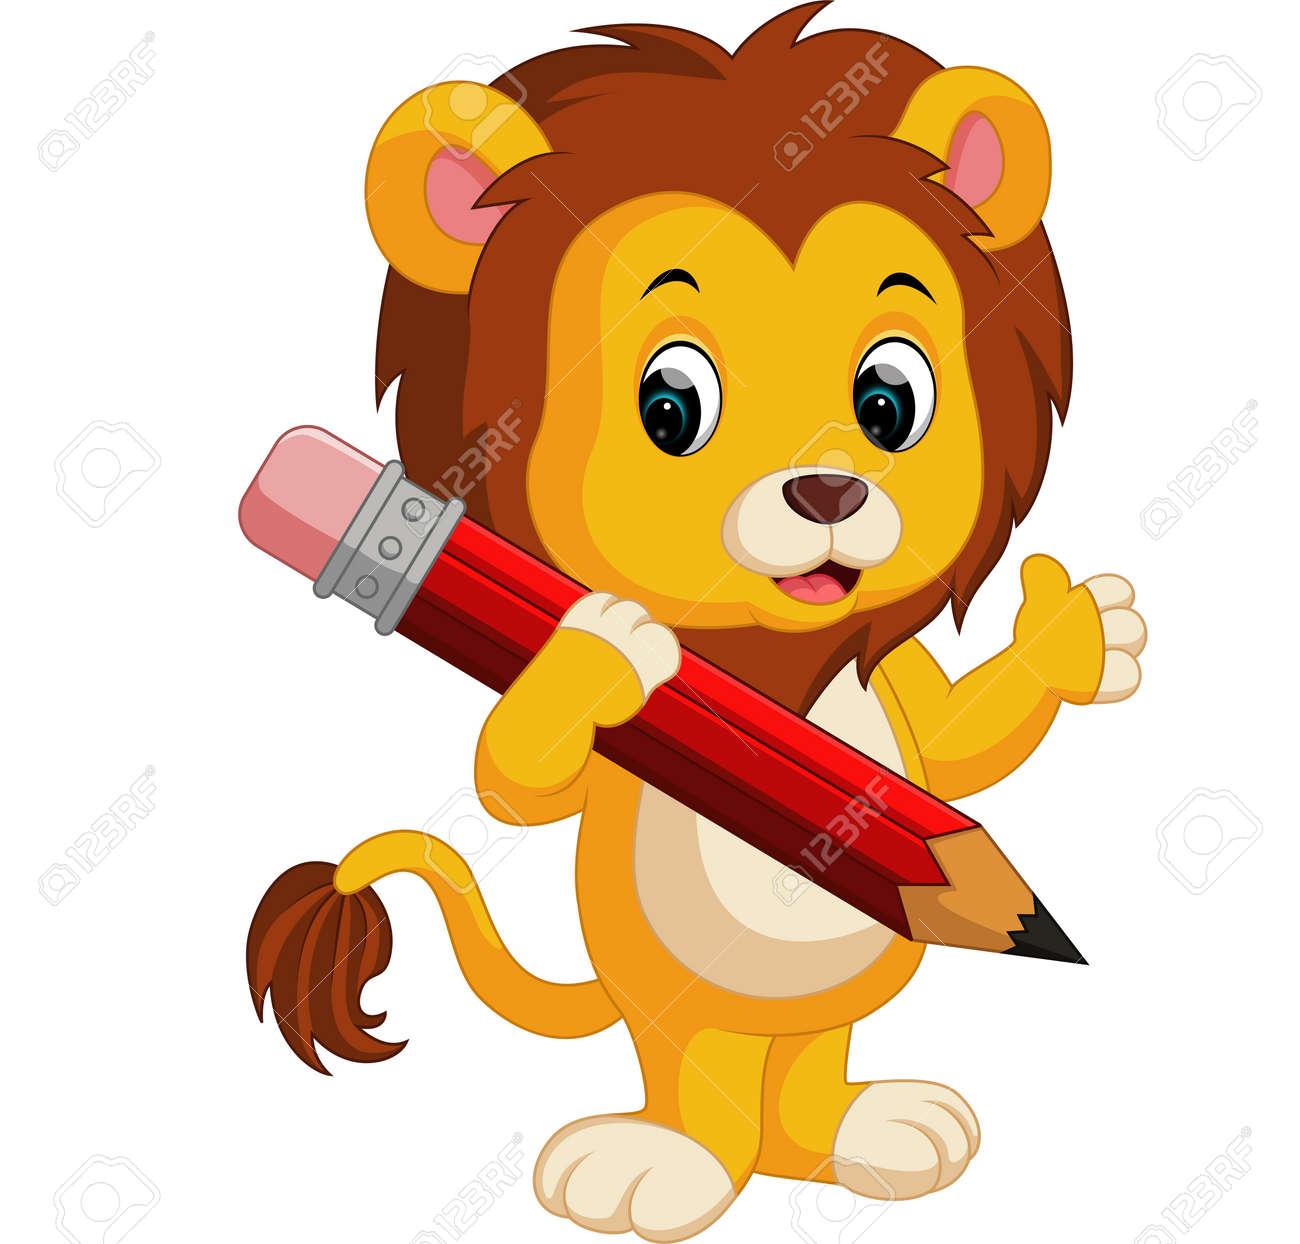 Cute lion cartoon holding pencil - 69696960